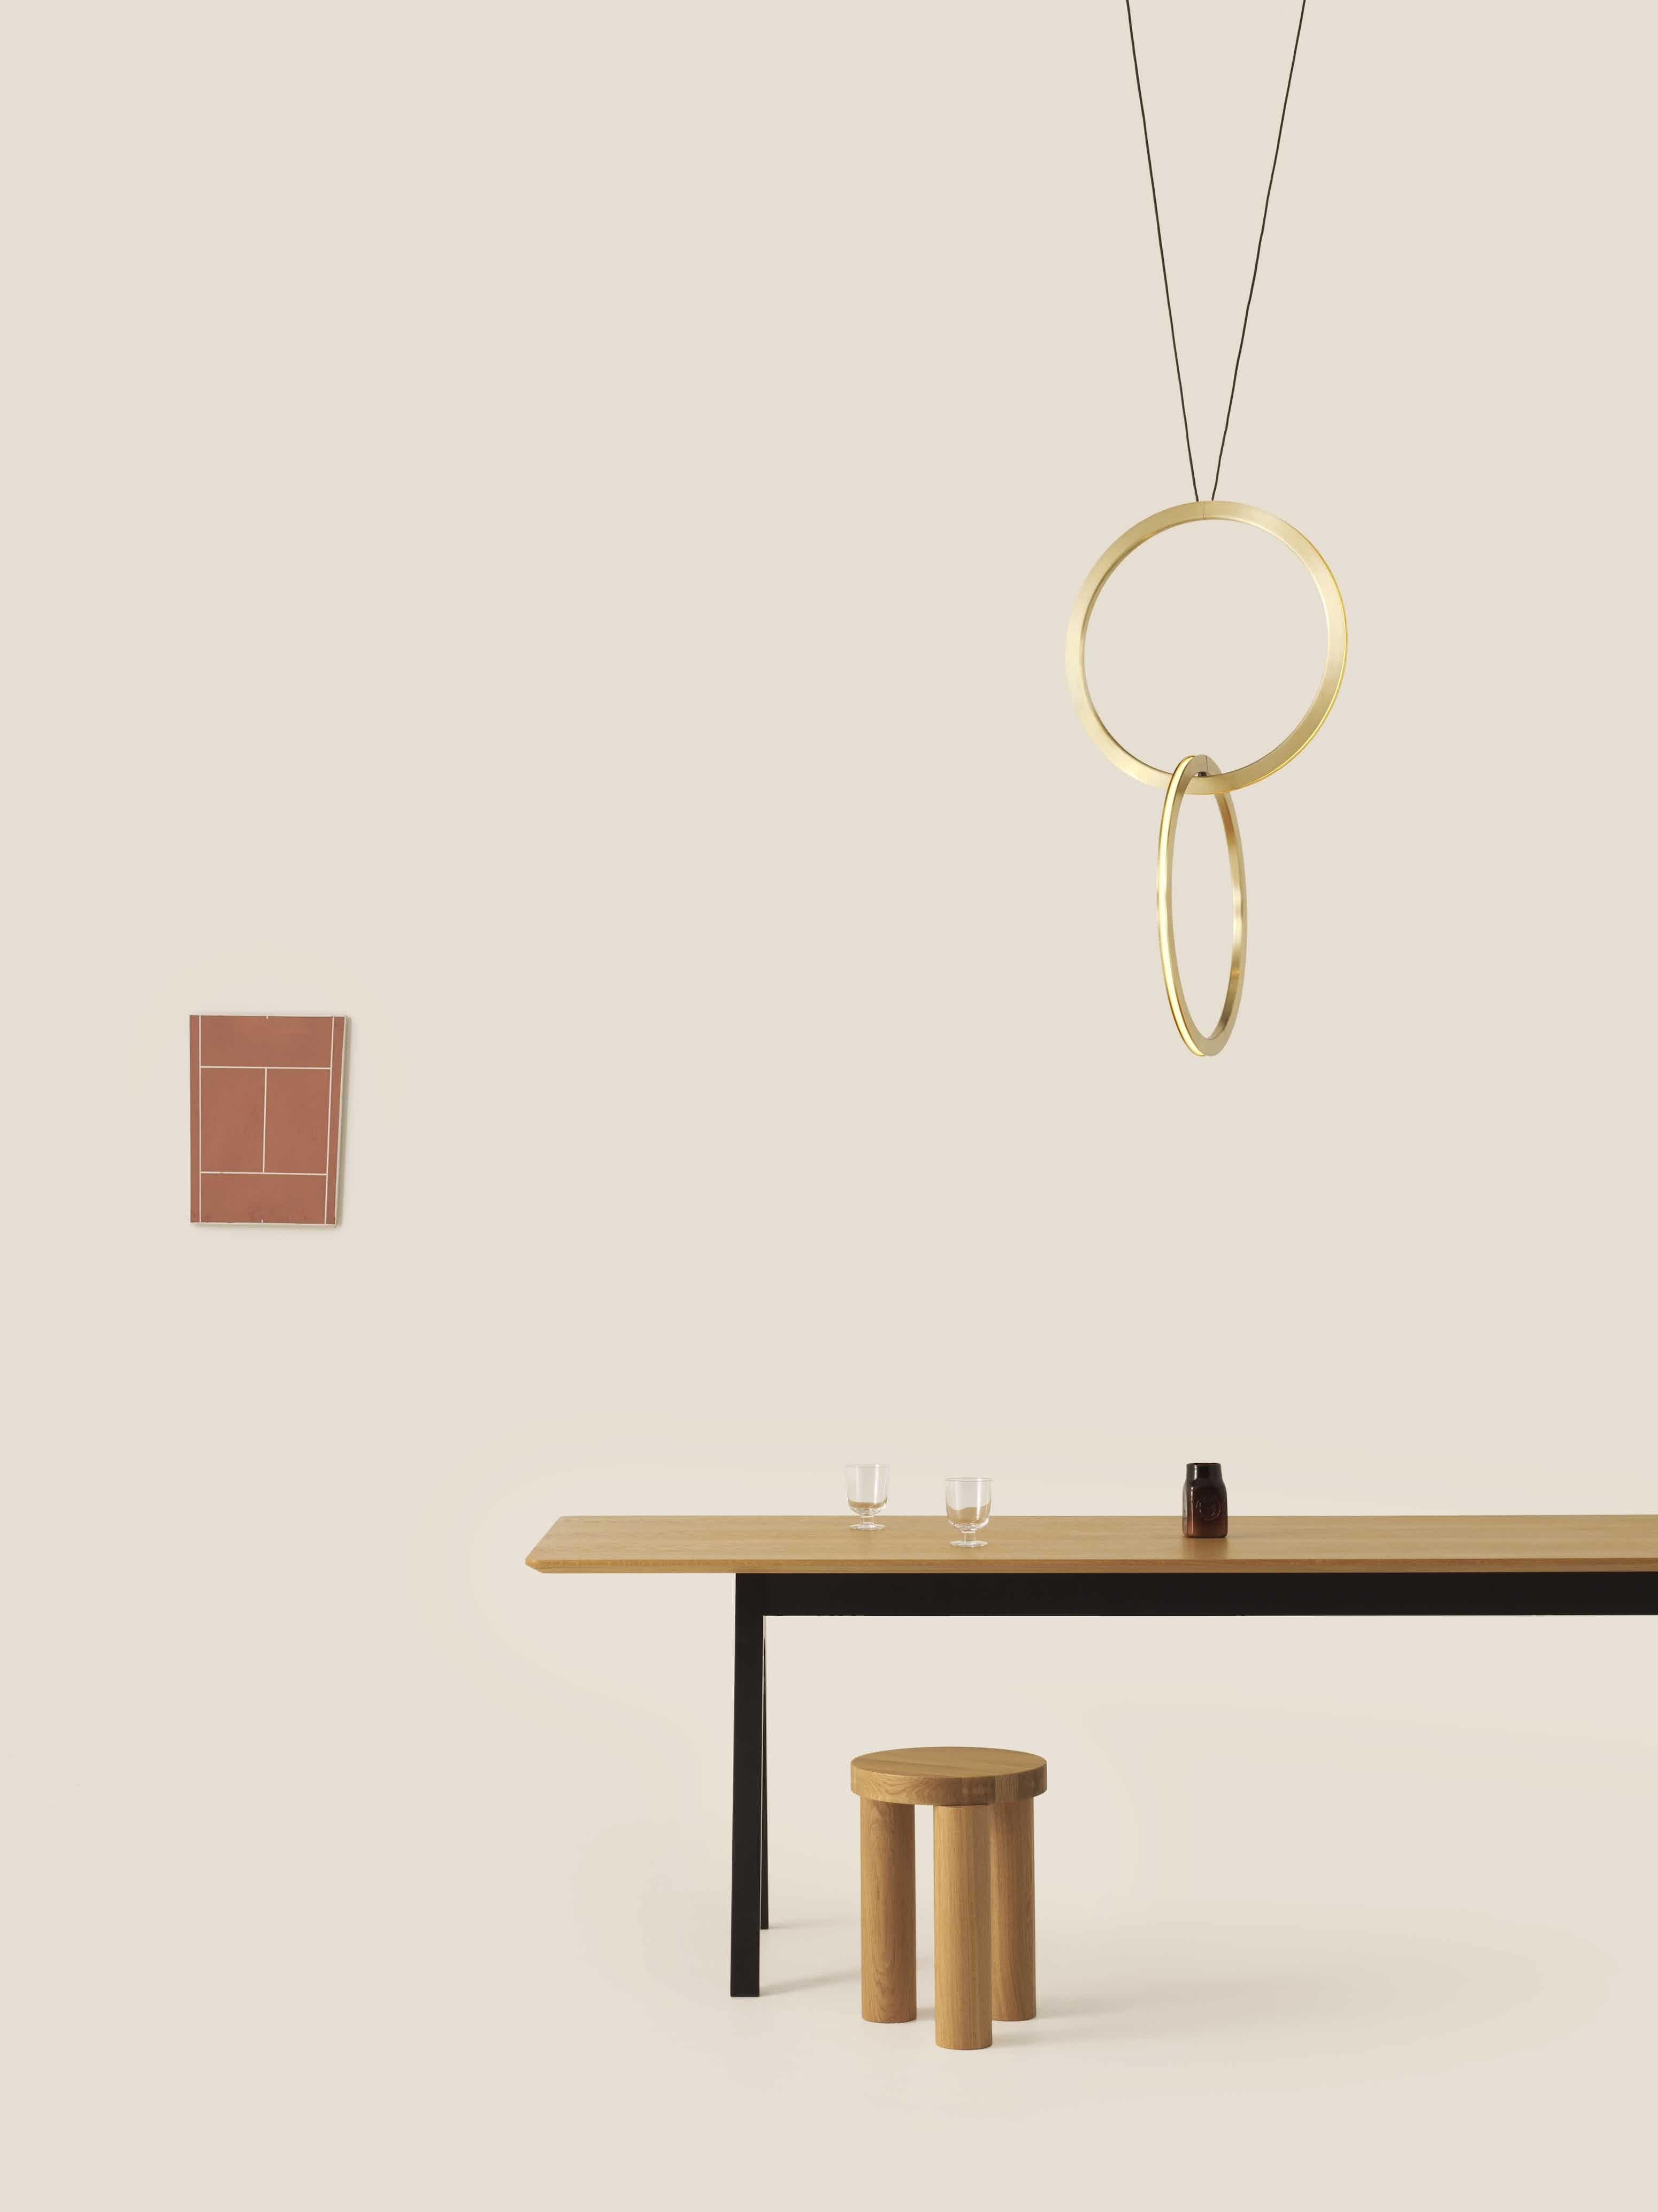 Resident furniture offset stool table insitu haute living